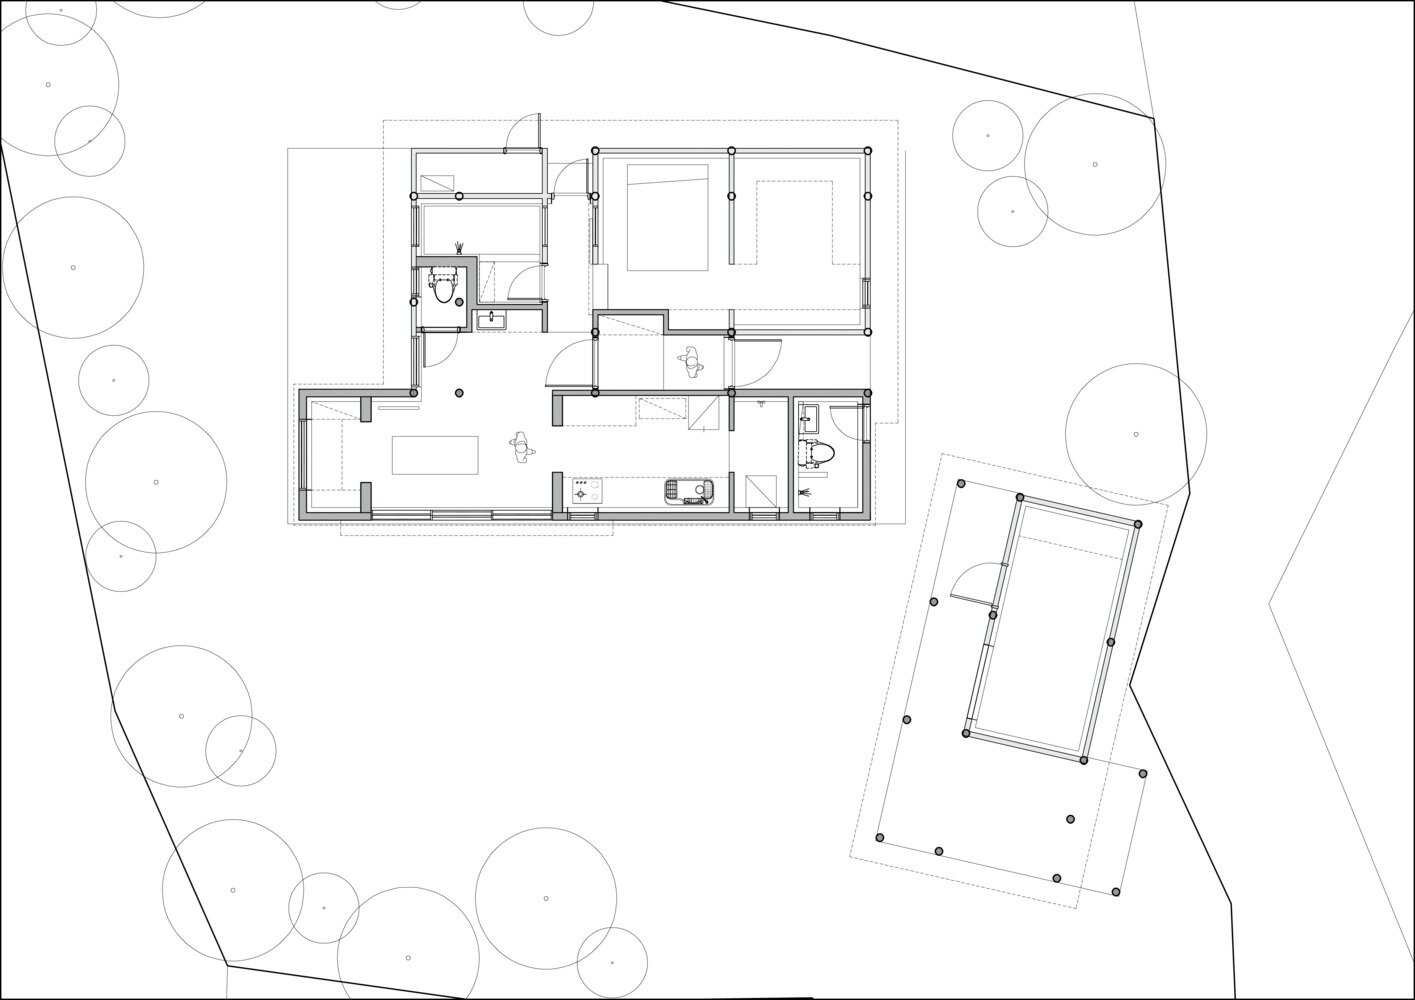 Traditional Korean Home Floor Plan